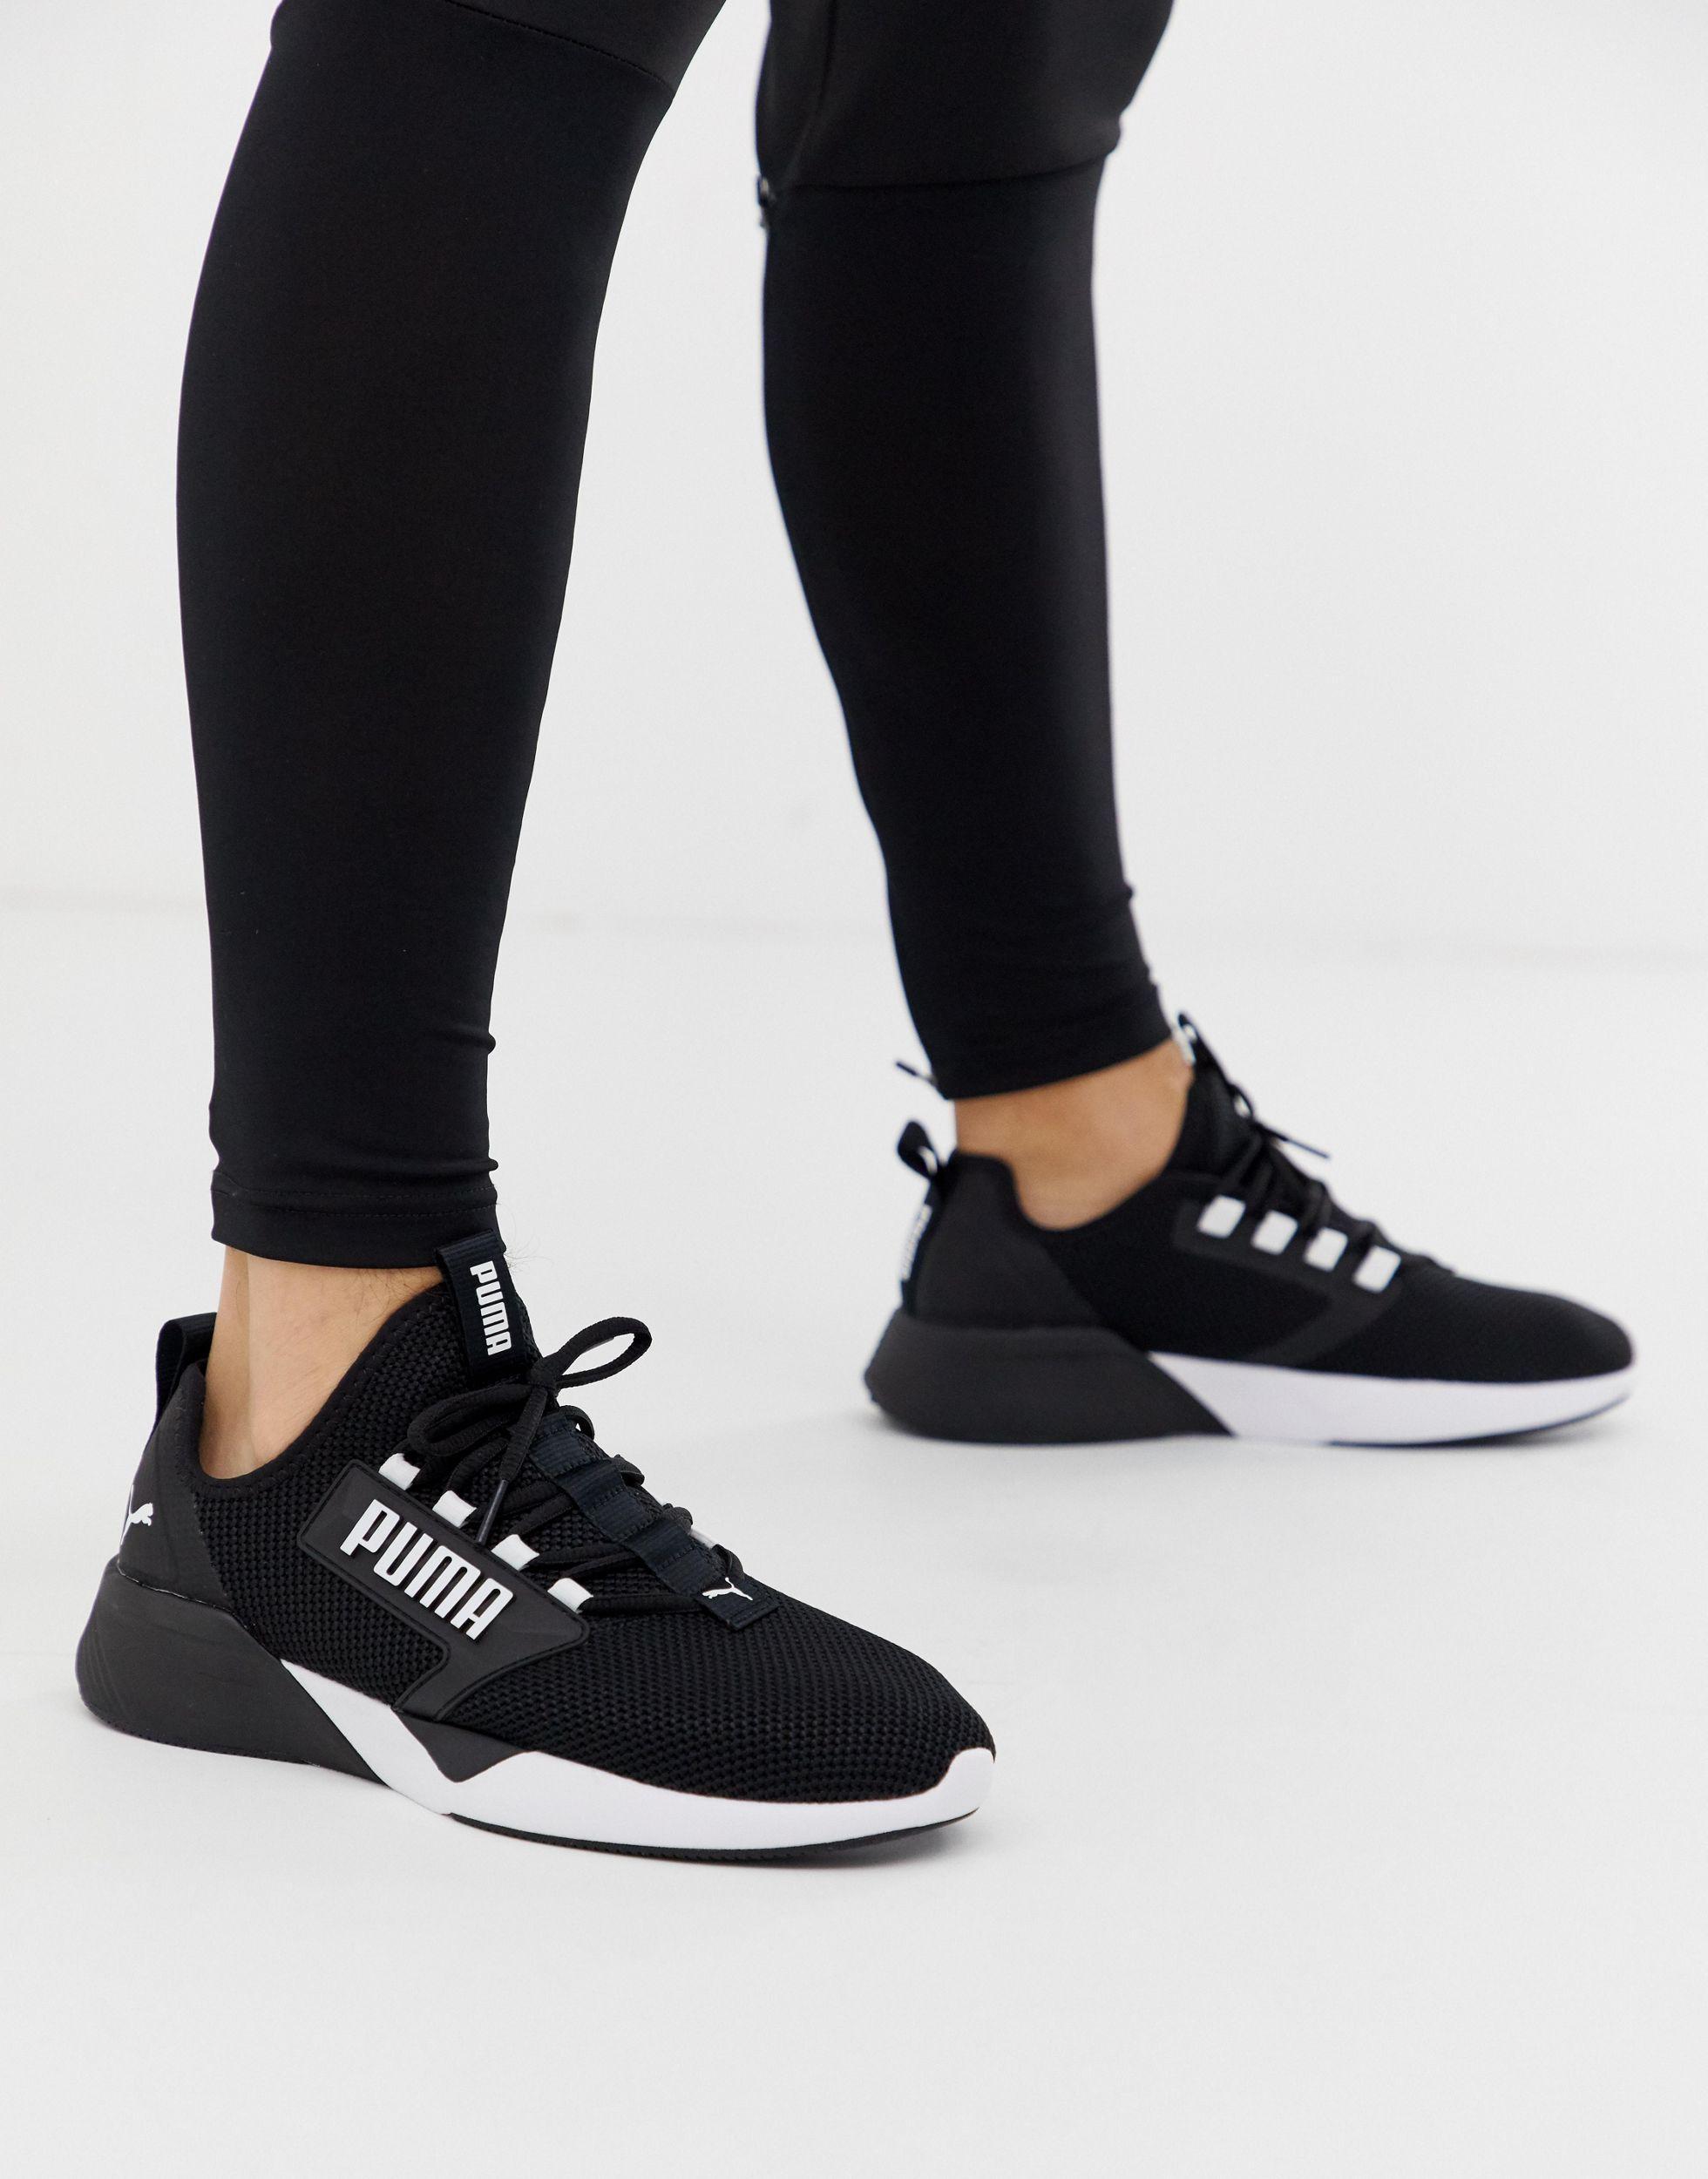 PUMA Retaliate Training Shoes in Black